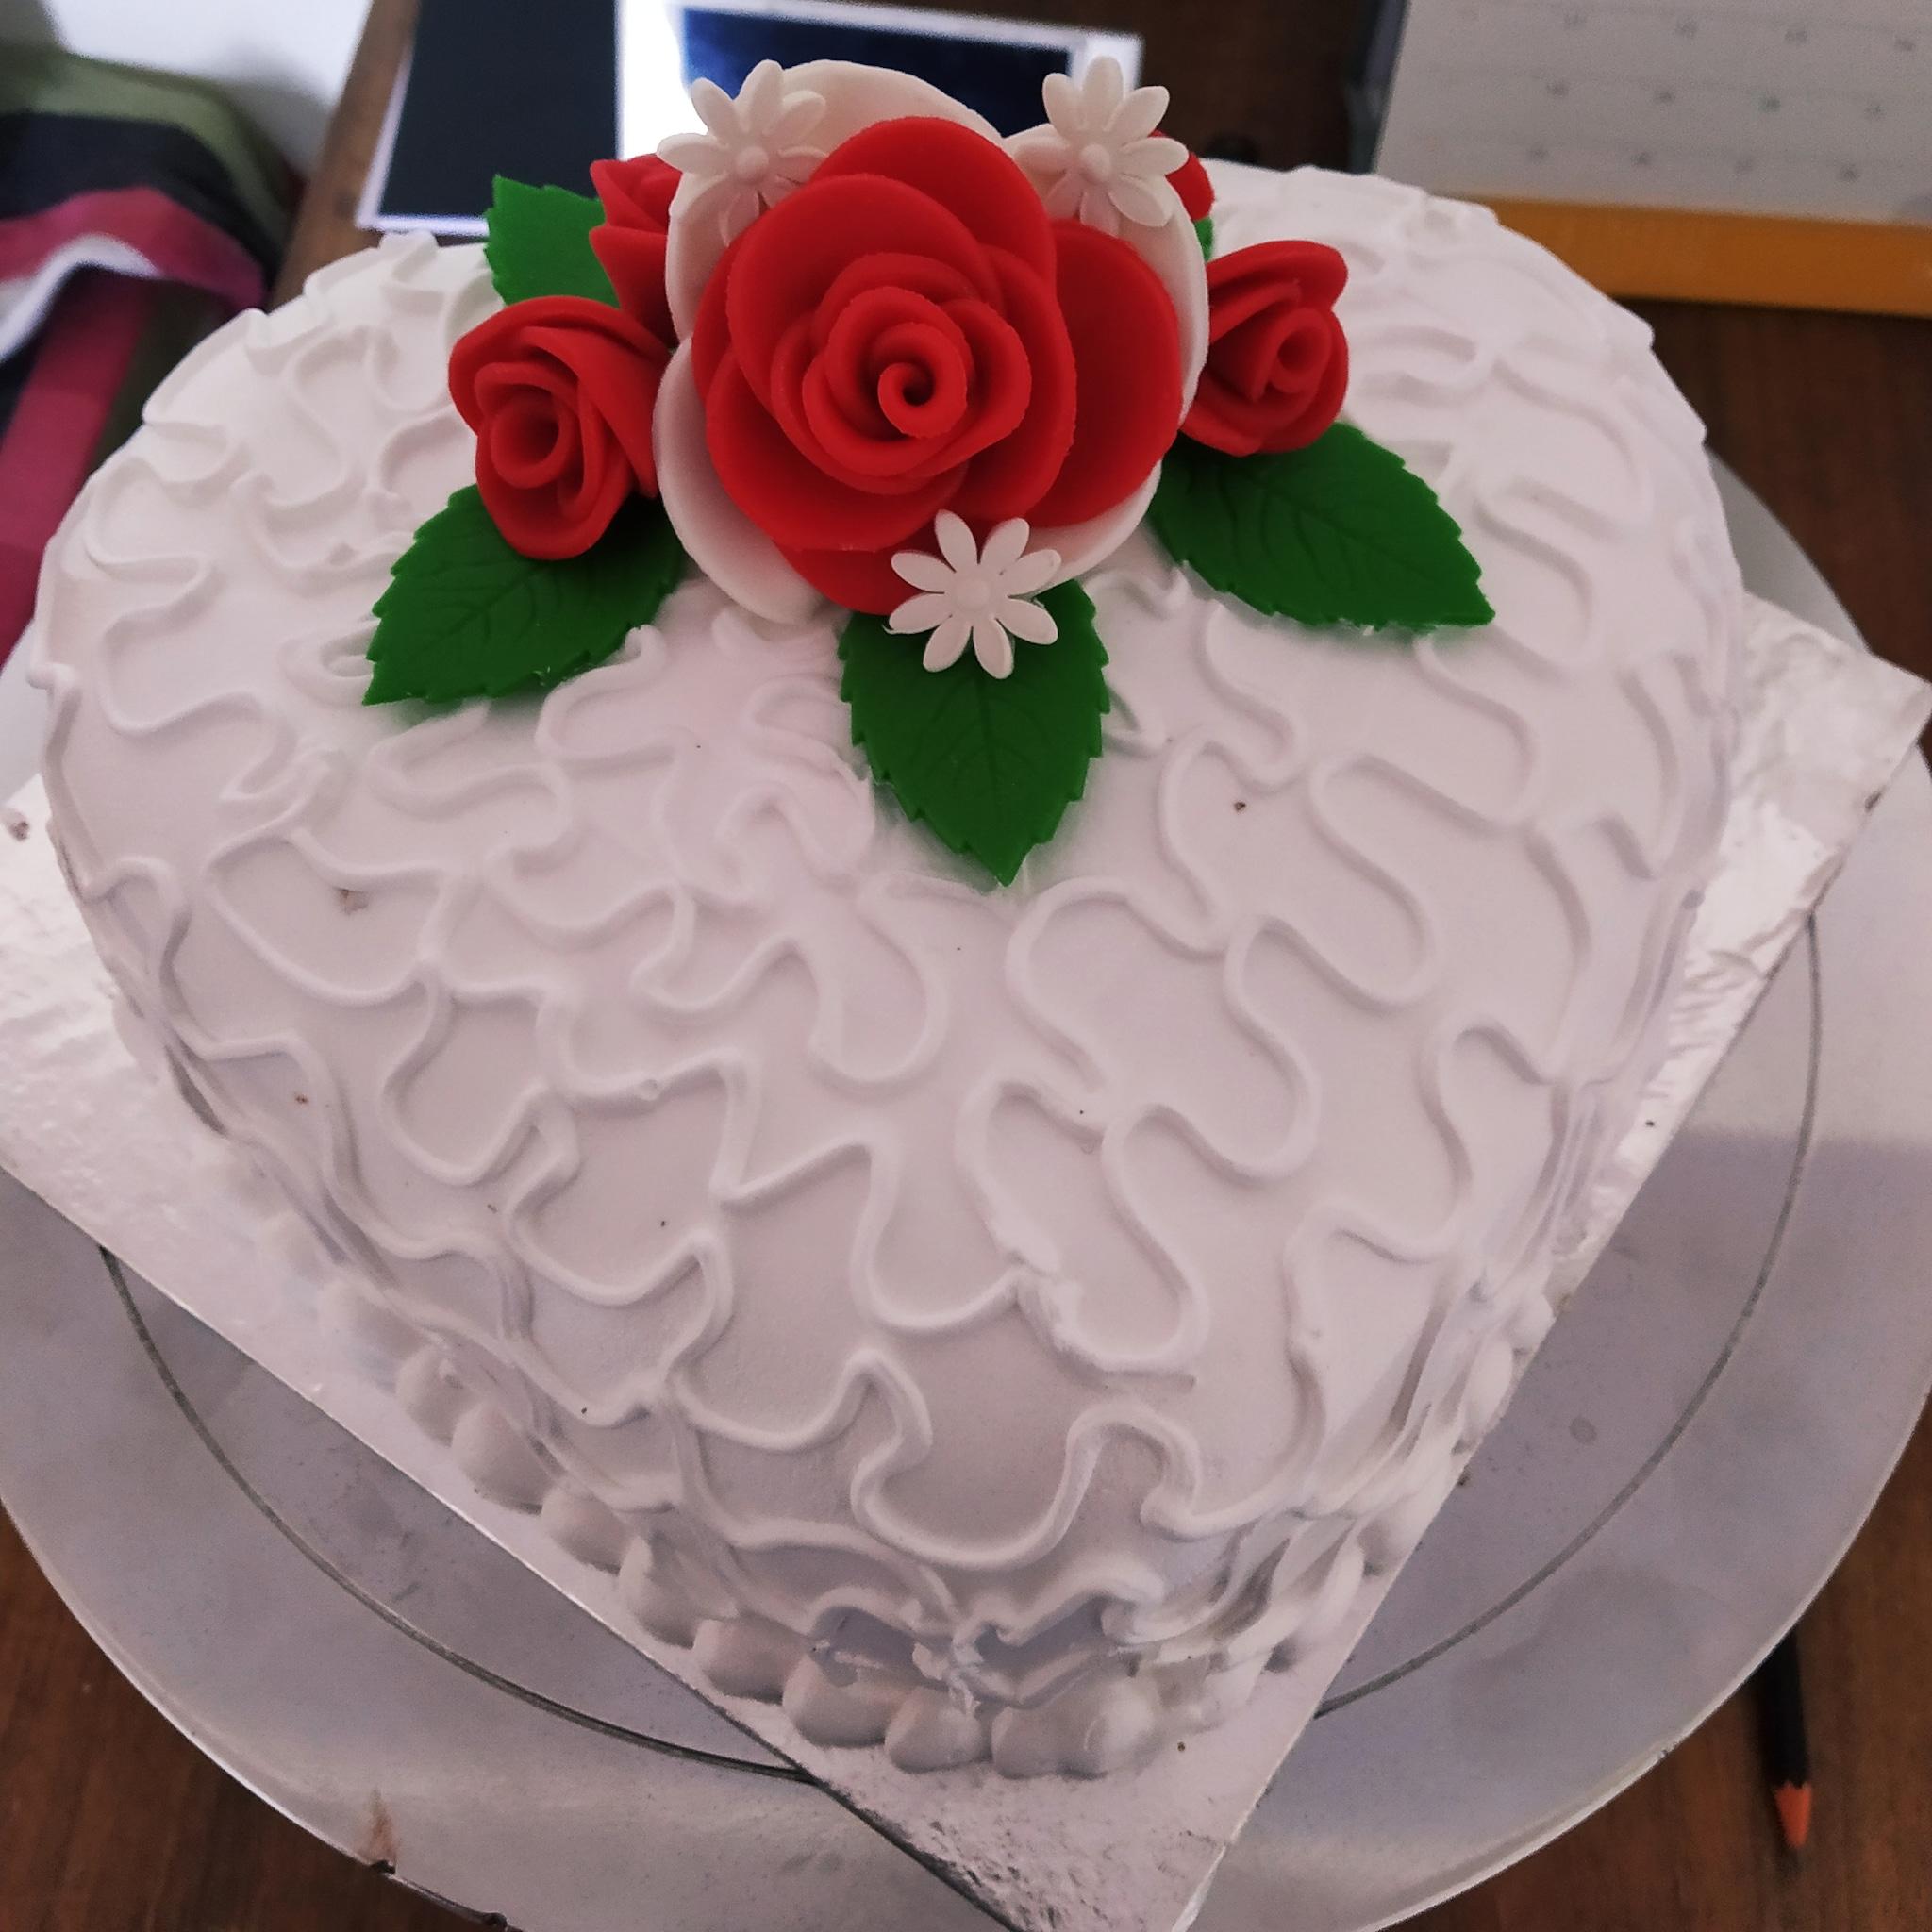 Rose Heart Cake (1 Kg,Chocolate)